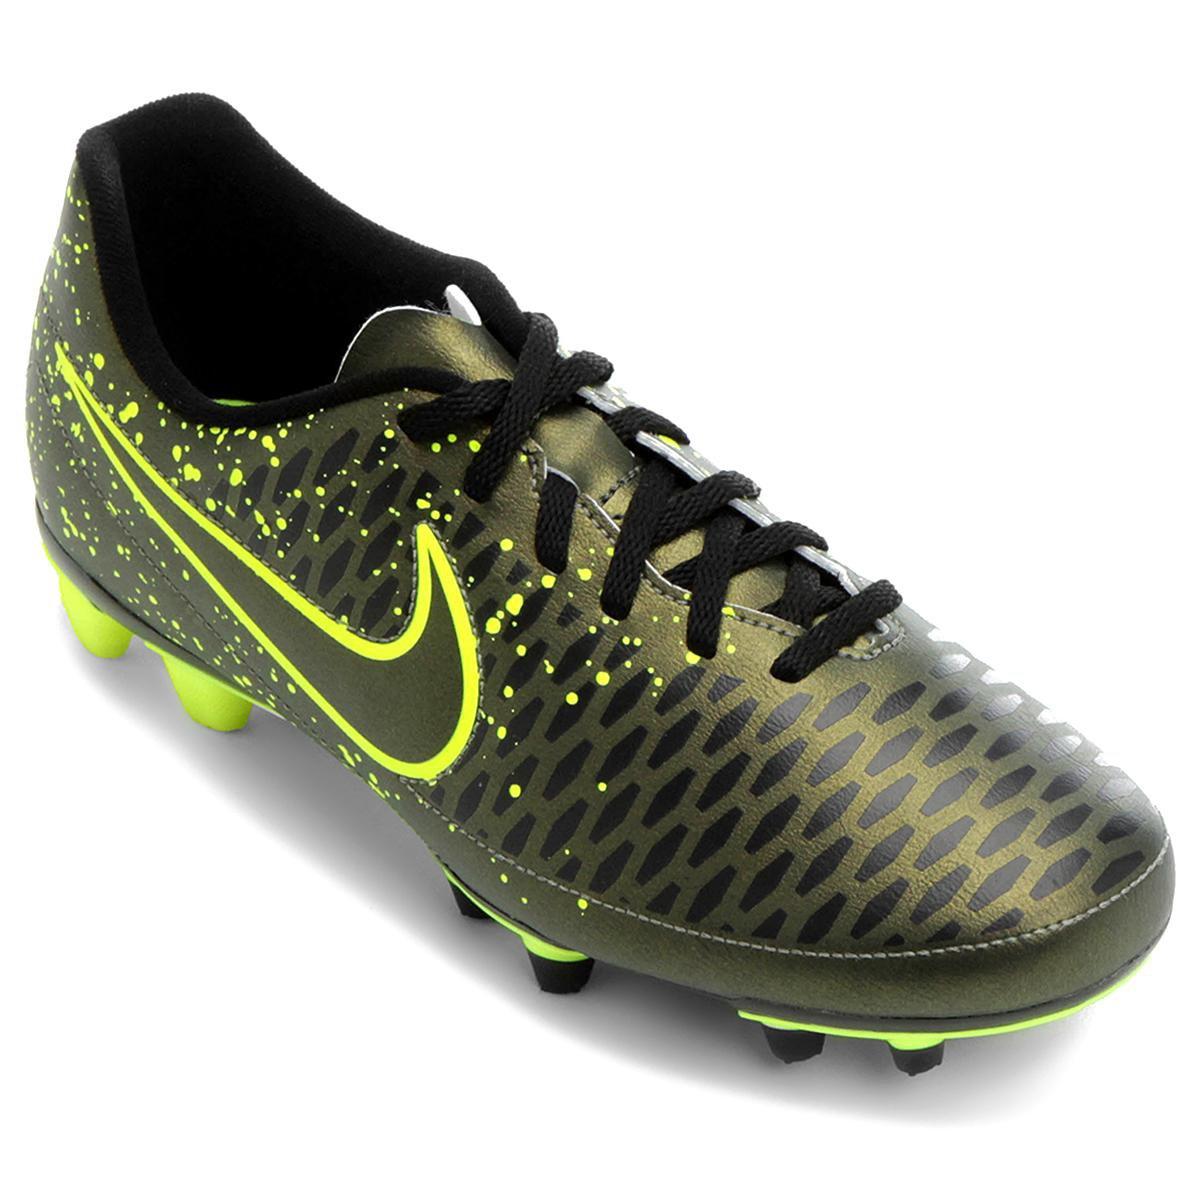 4b8809d749c69 Chuteira Nike Magista Ola FG Campo - Compre Agora